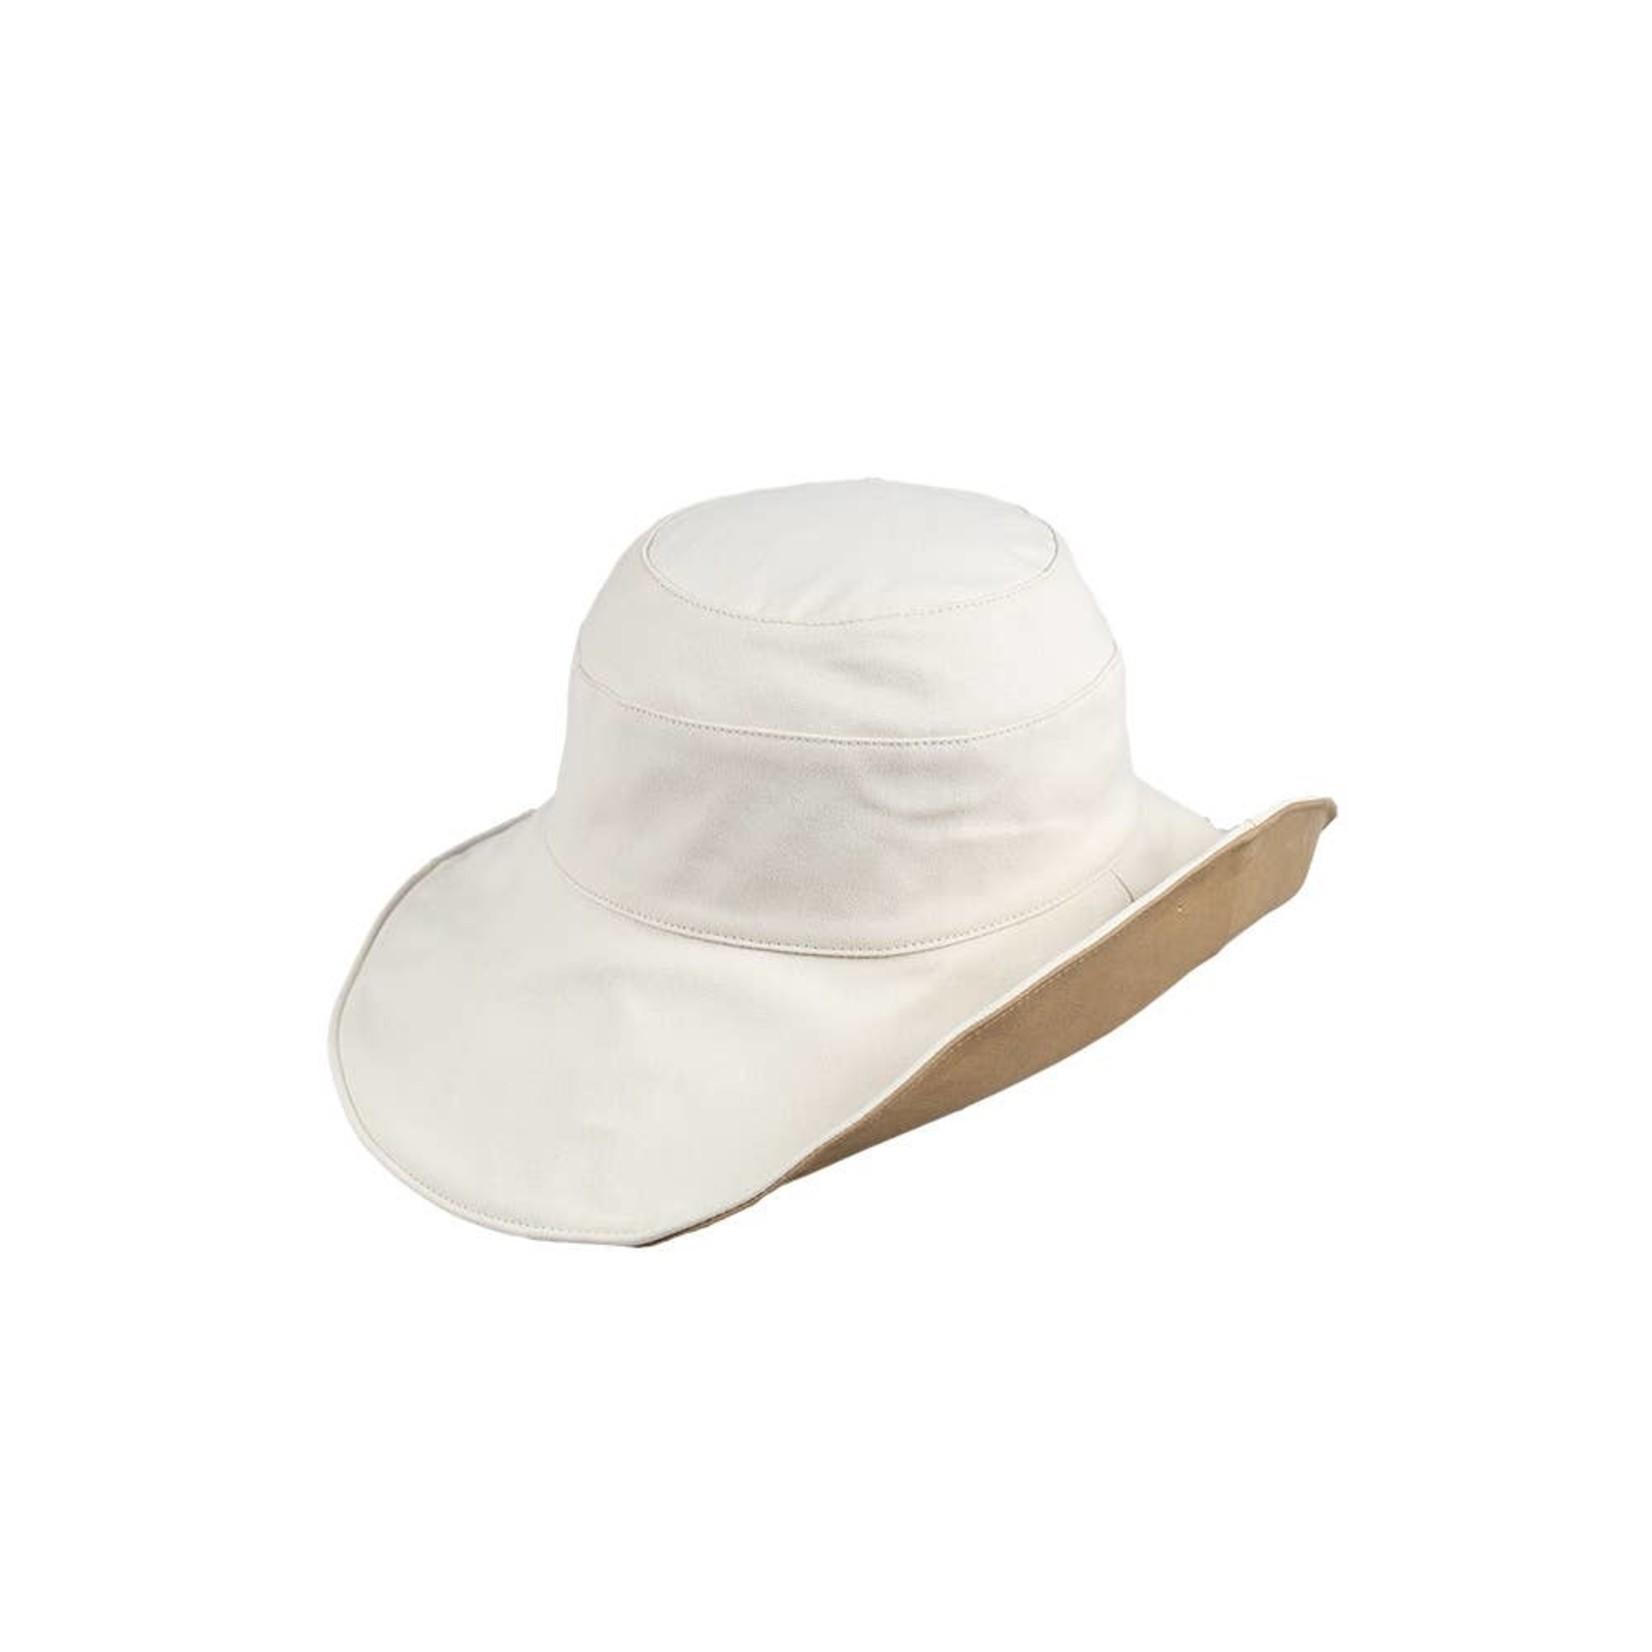 Jeanne Simmons Reversible Cloth Hat Cream/Tan